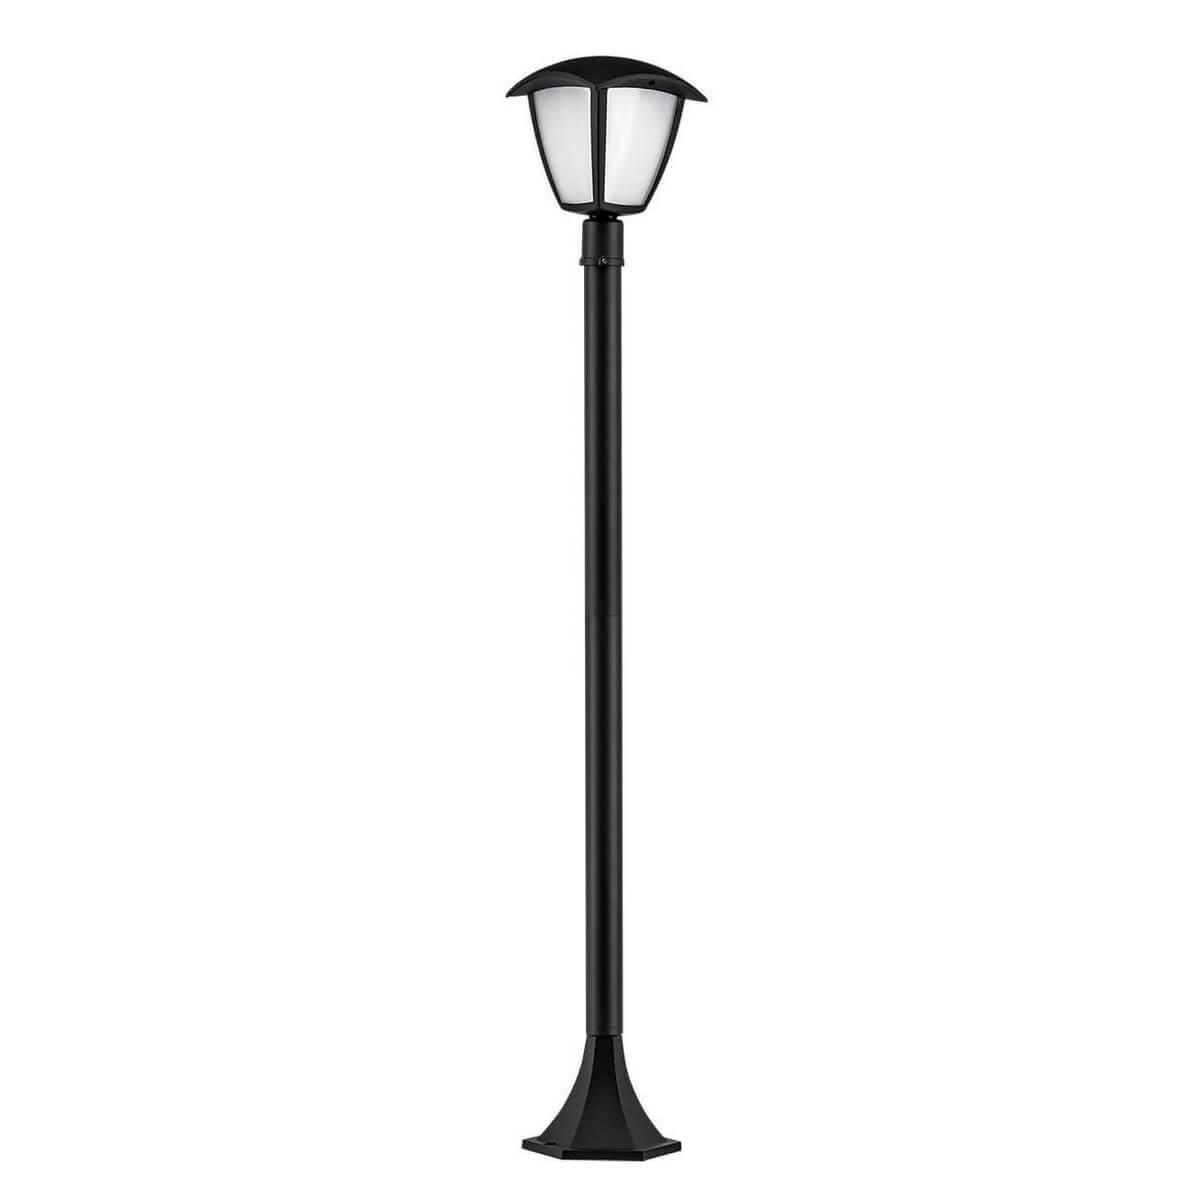 Уличный светодиодный светильник Lightstar Lampione 375770